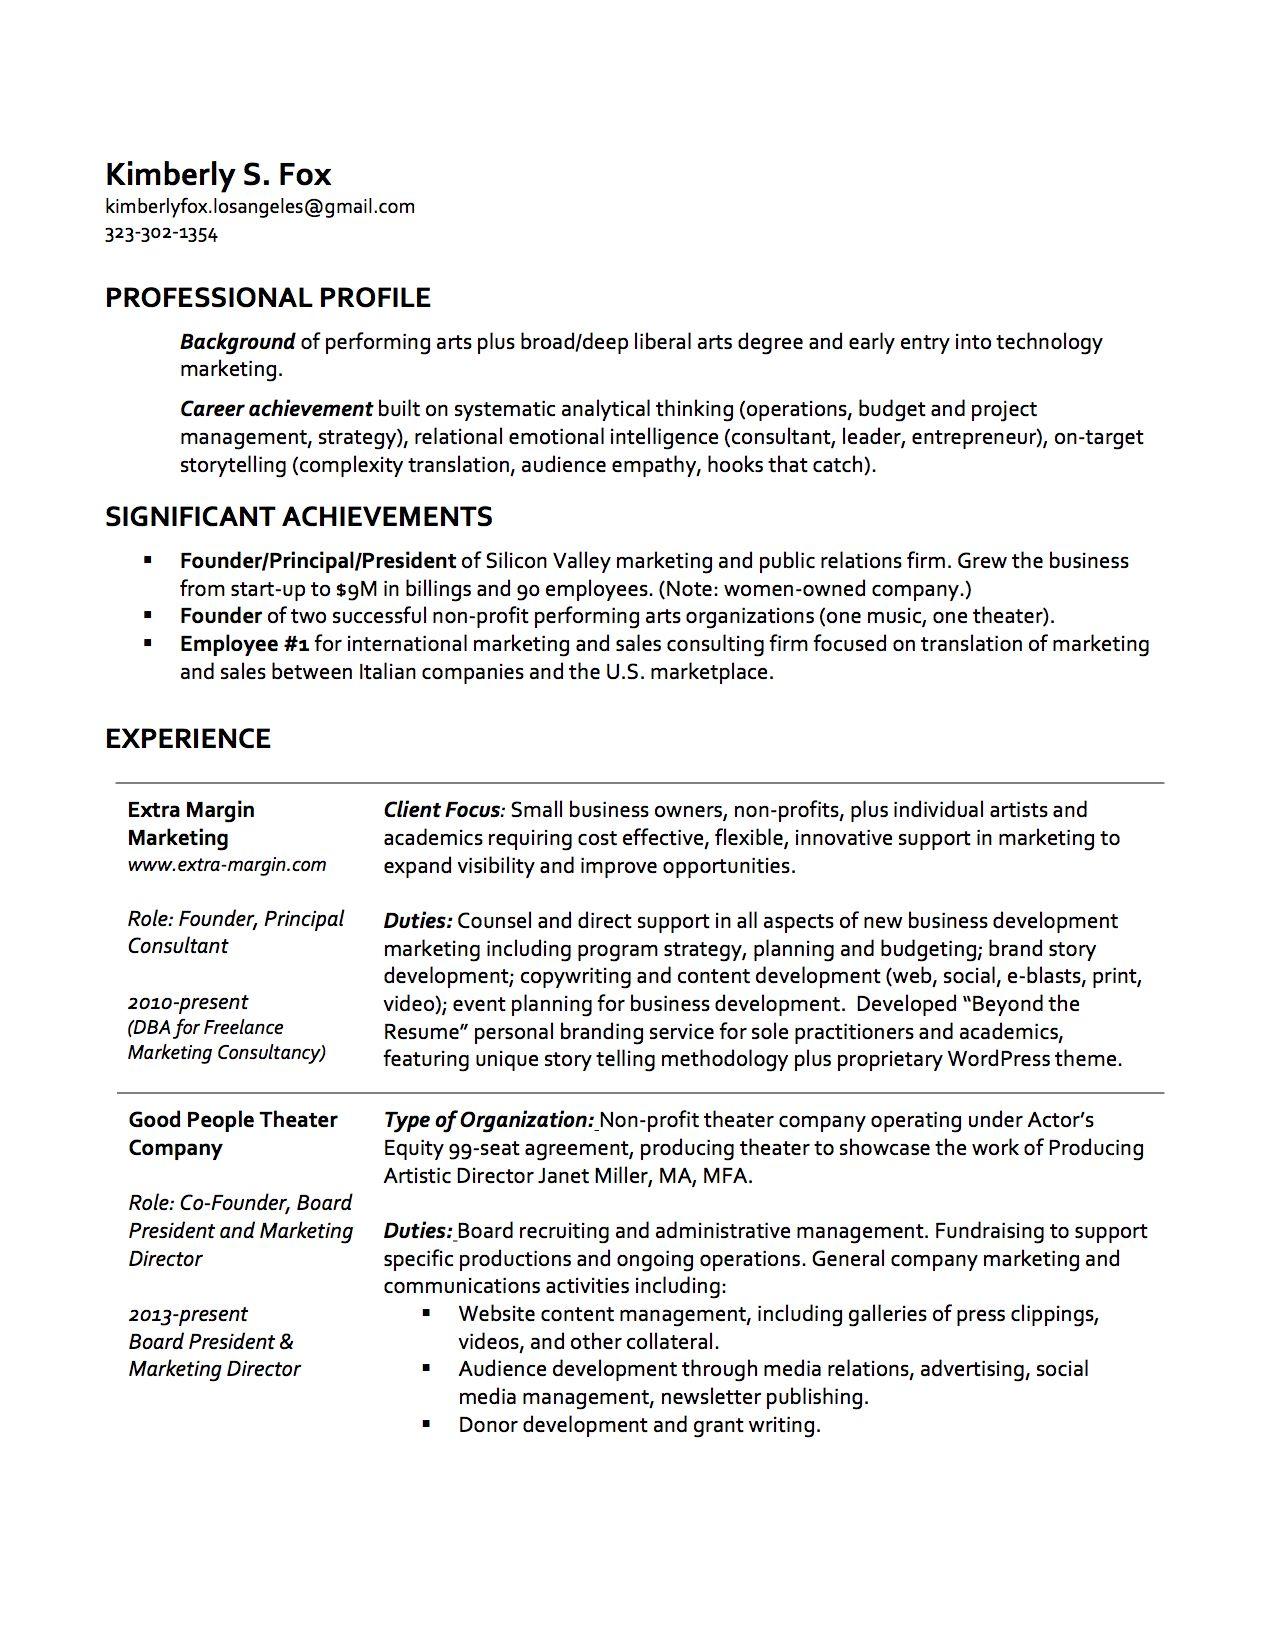 Resume Page 1 Marketing Technology Job Search Performance Art